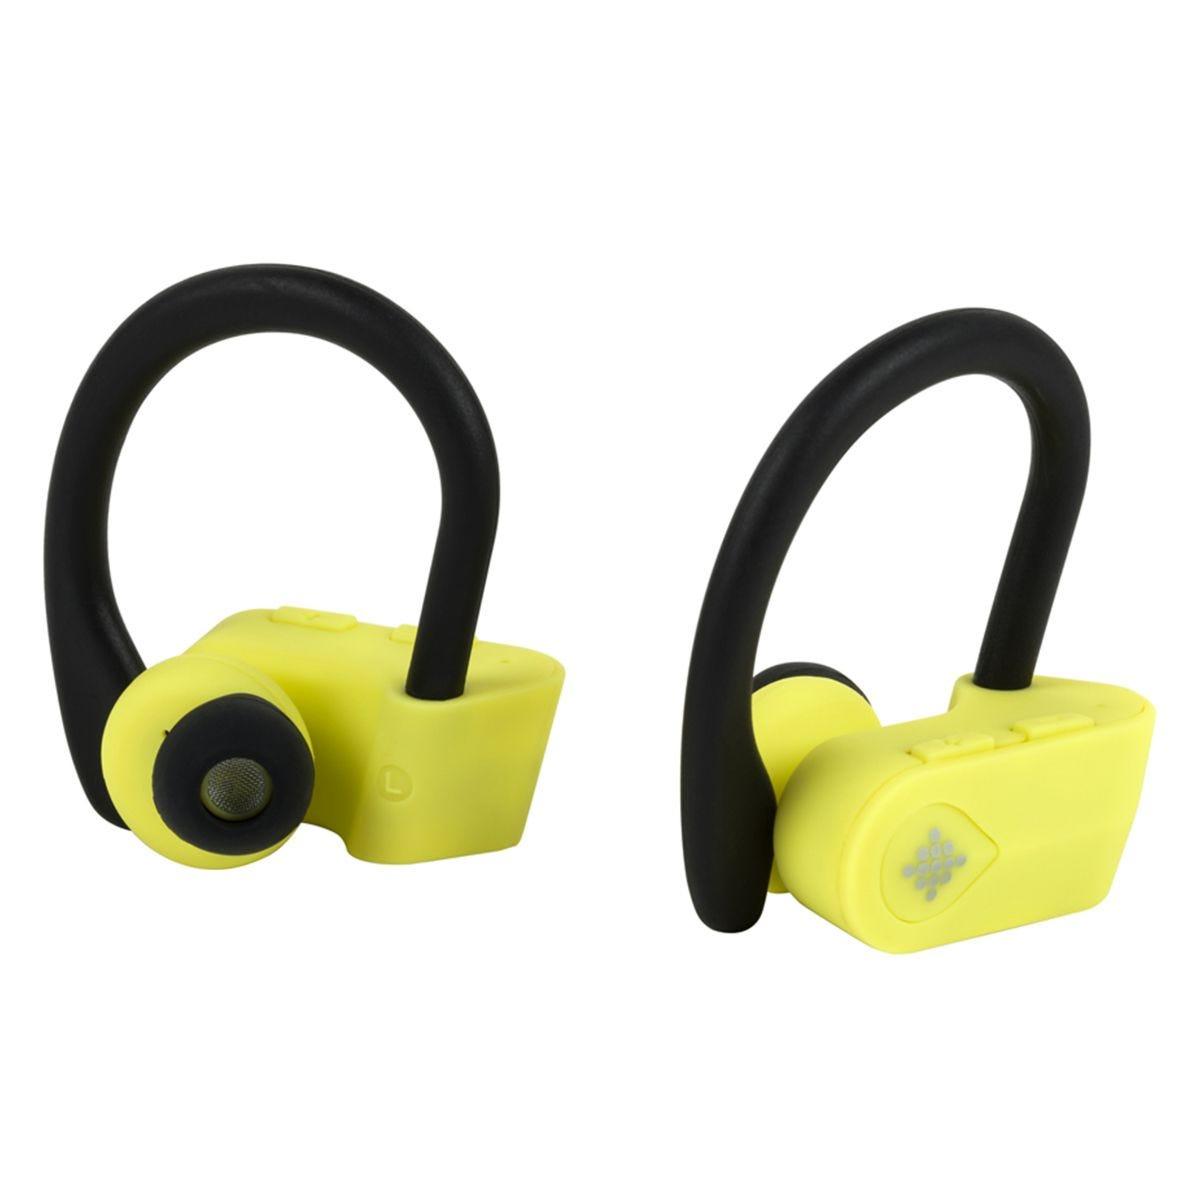 Intempo EE3888YELBLKSTKEUAIR Active TWS 10 Wireless Bluetooth Earphones - Yellow/Black